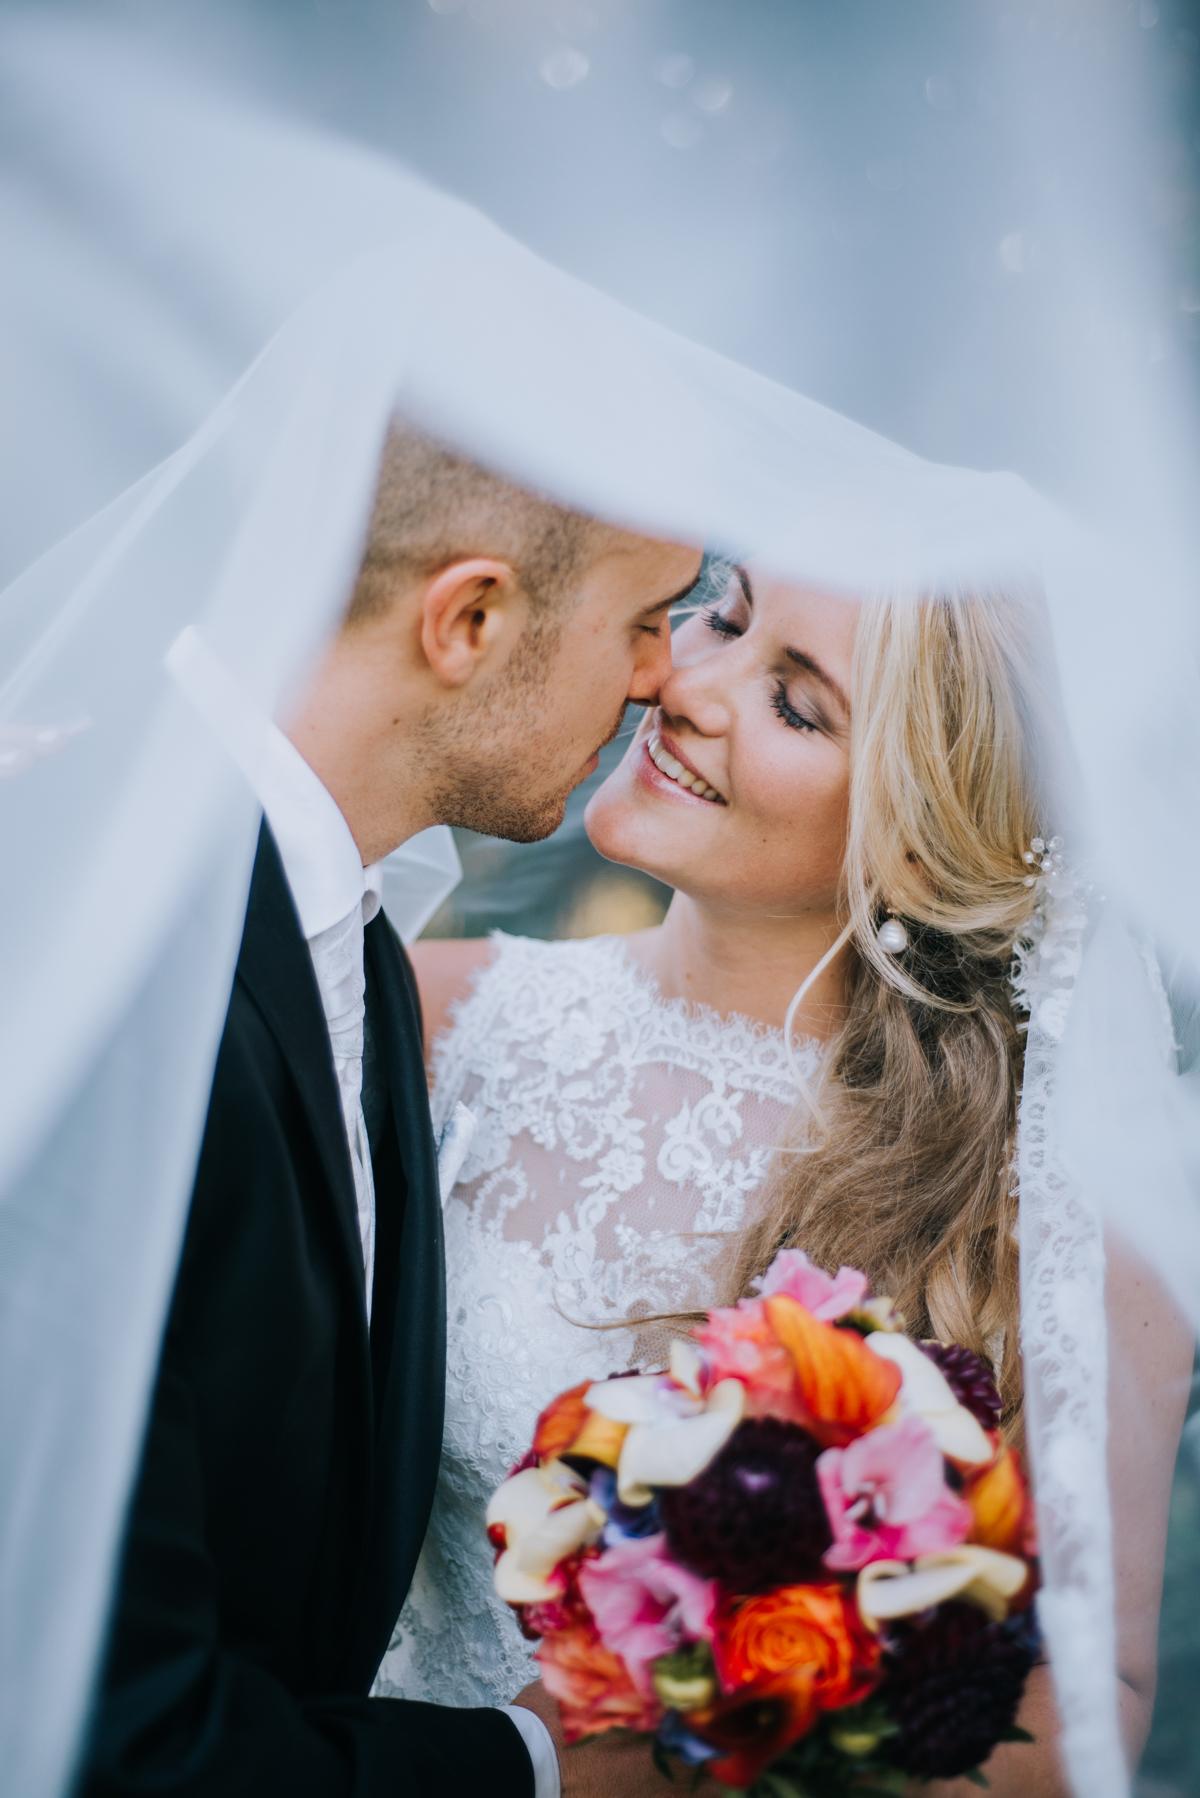 multikulturell heiraten, multikulturelle Hochzeit